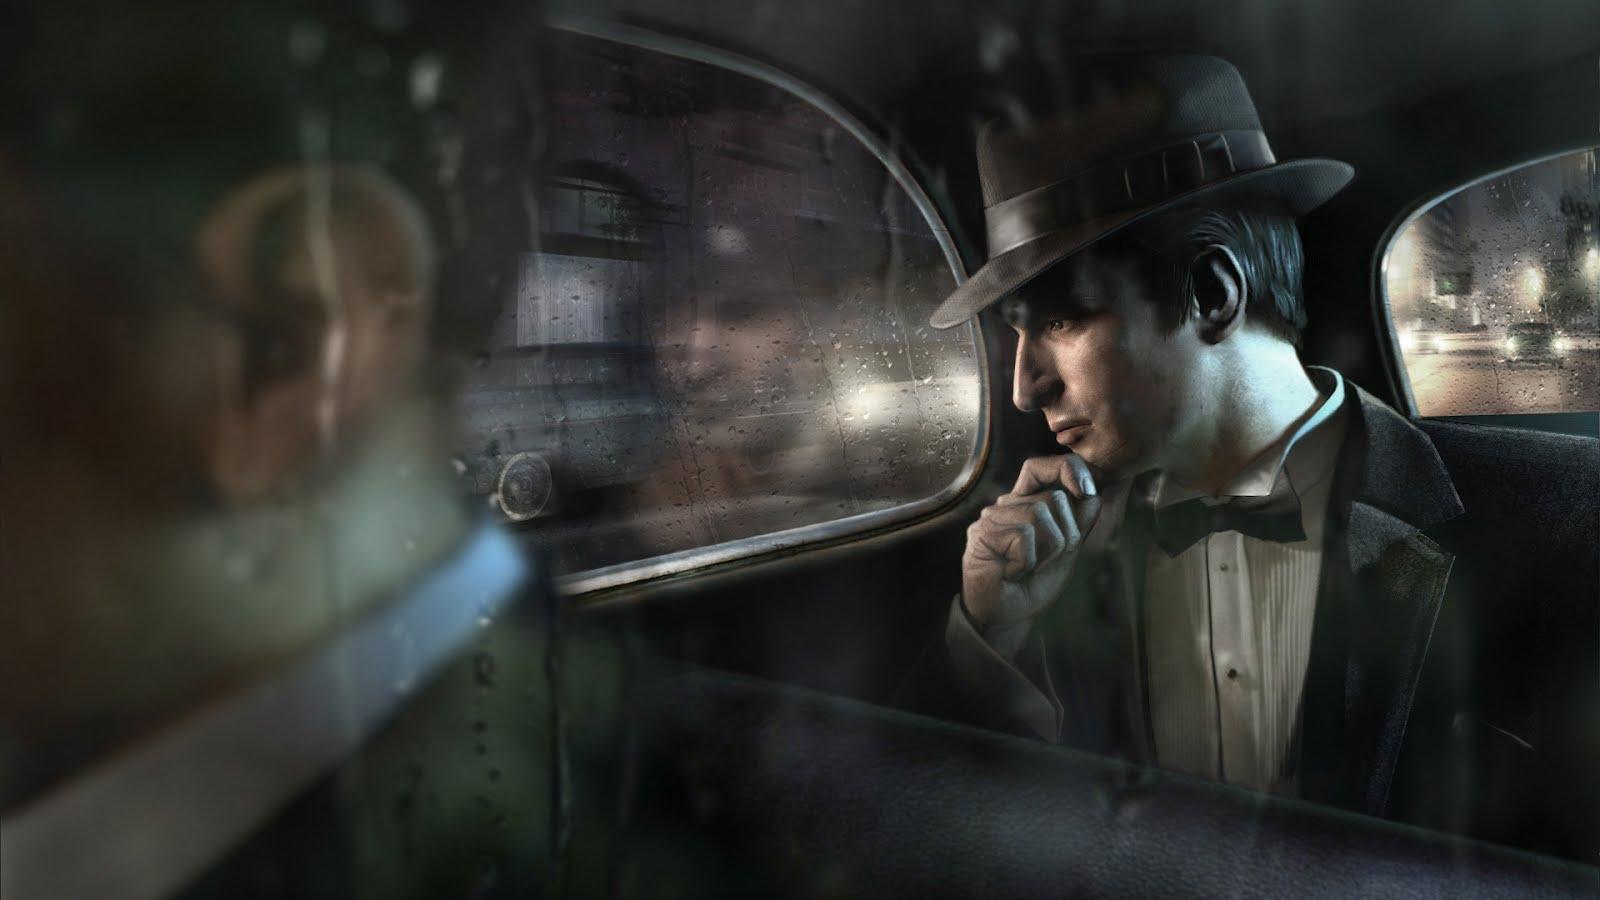 http://1.bp.blogspot.com/-NkUAakIxWDo/UAkim6uSO1I/AAAAAAAAB1s/xFBOwL10Fc4/s1600/mafia2_limousine_vito_artwork.jpg